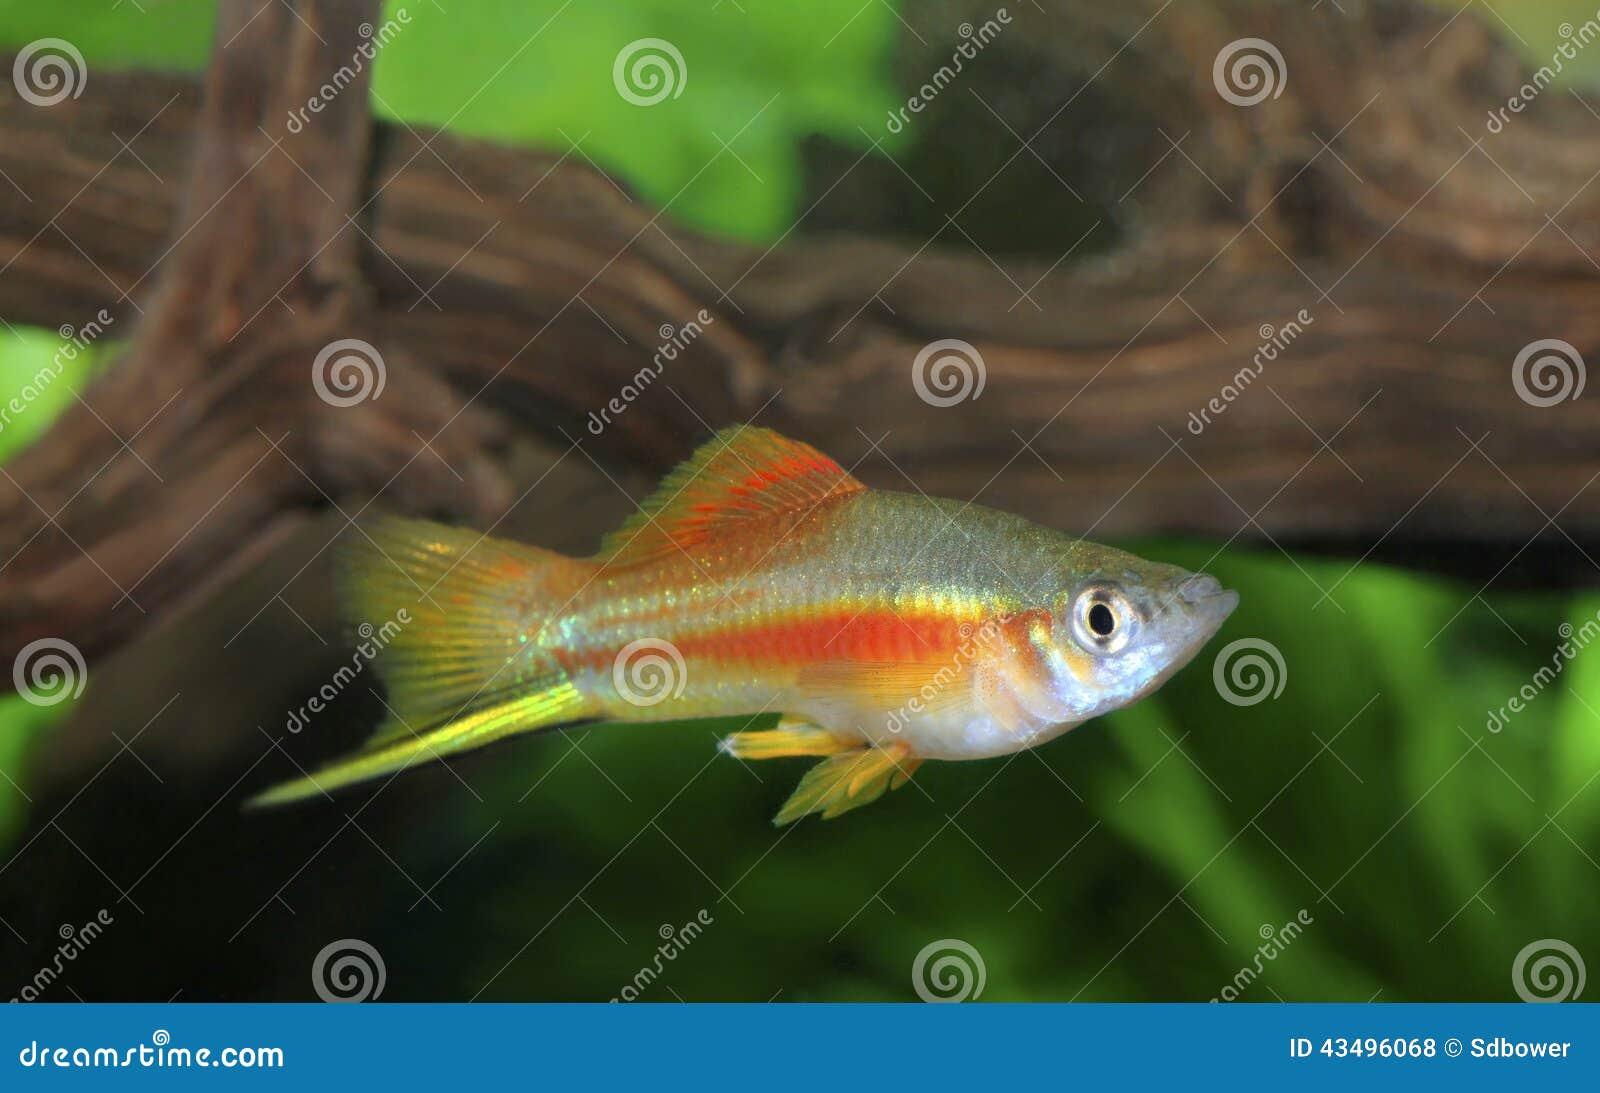 Colorful Male Neon Swordtail Fish In An Aquarium Stock Photo - Image ...